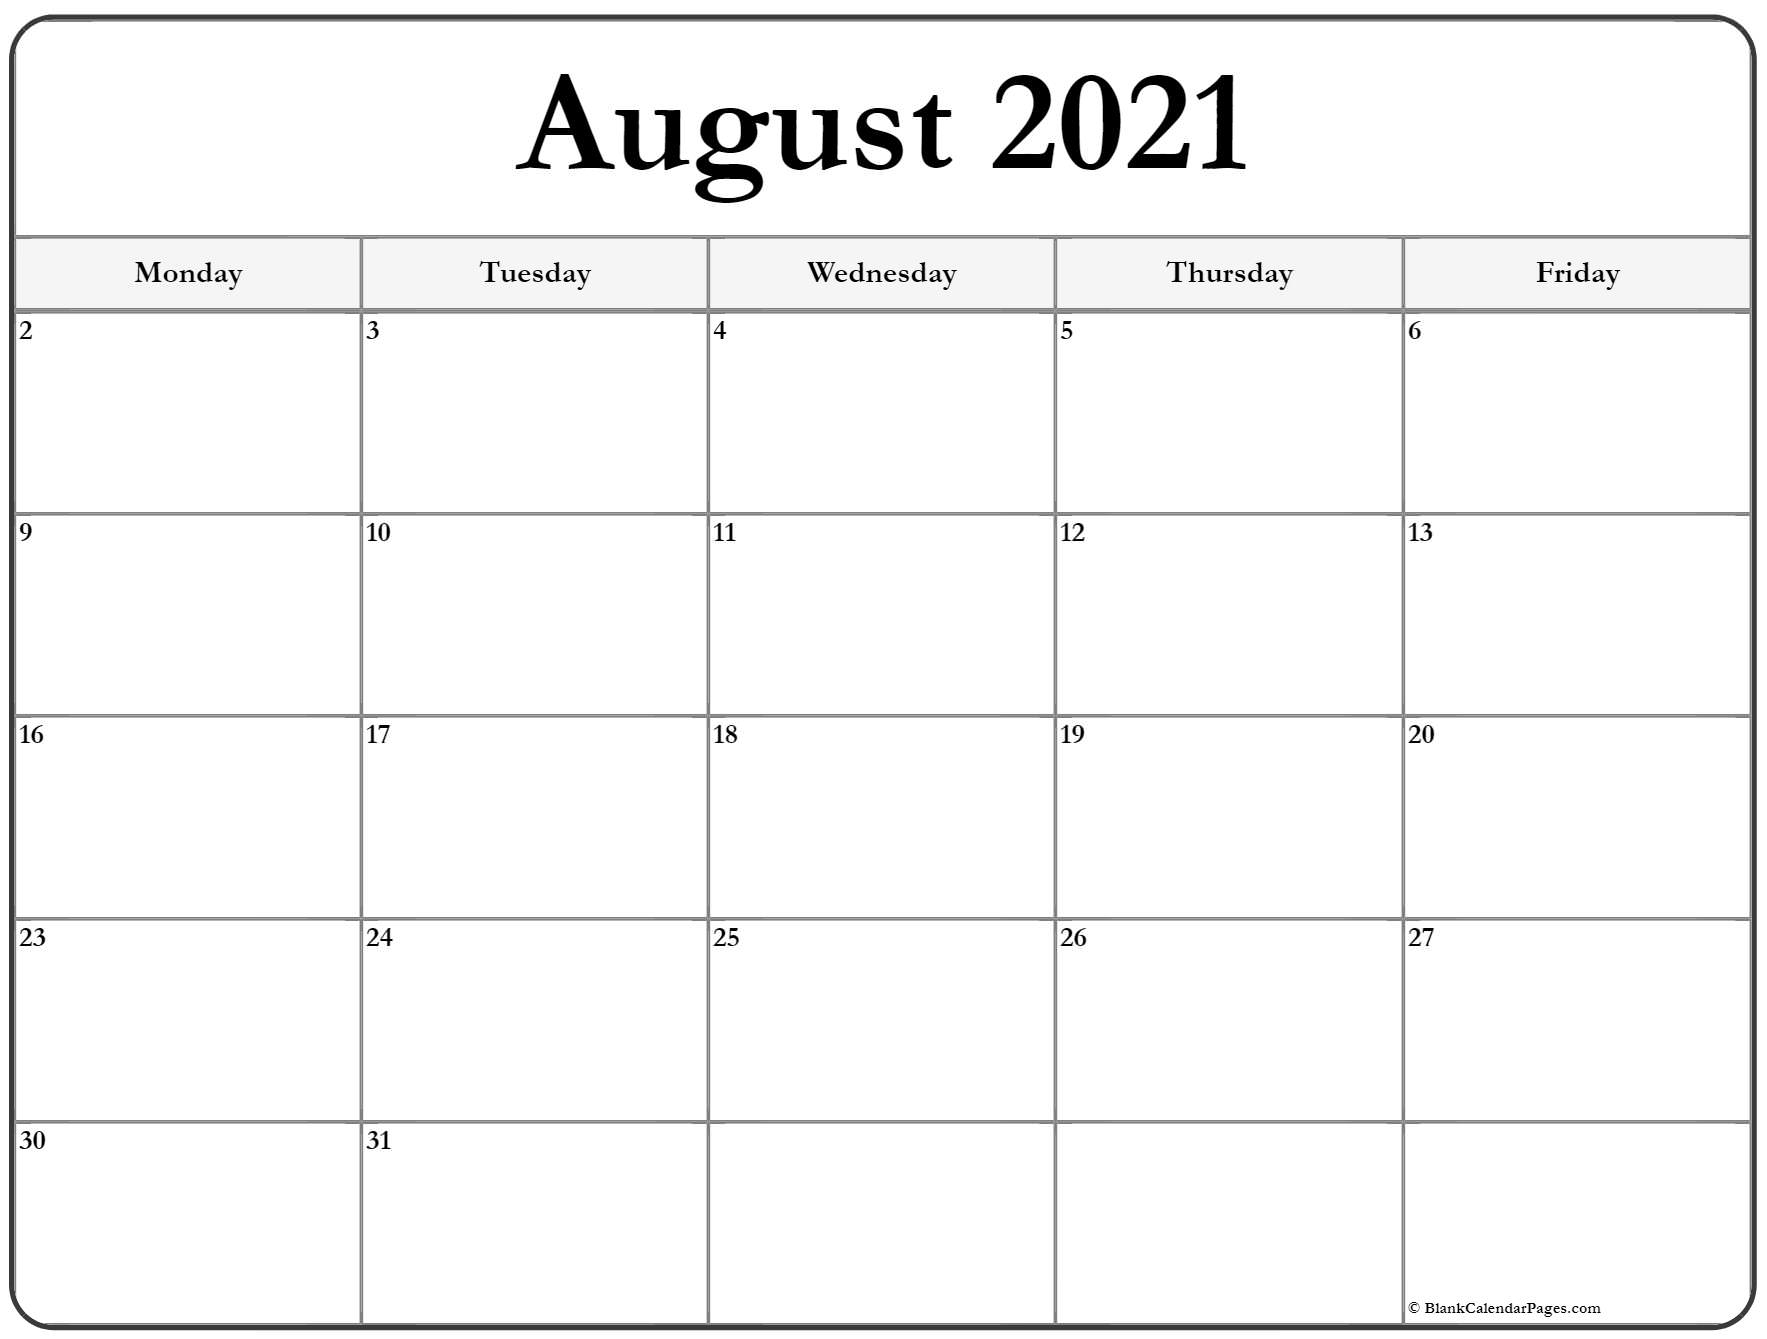 Get August 2021 Monday To Sunday Calendar